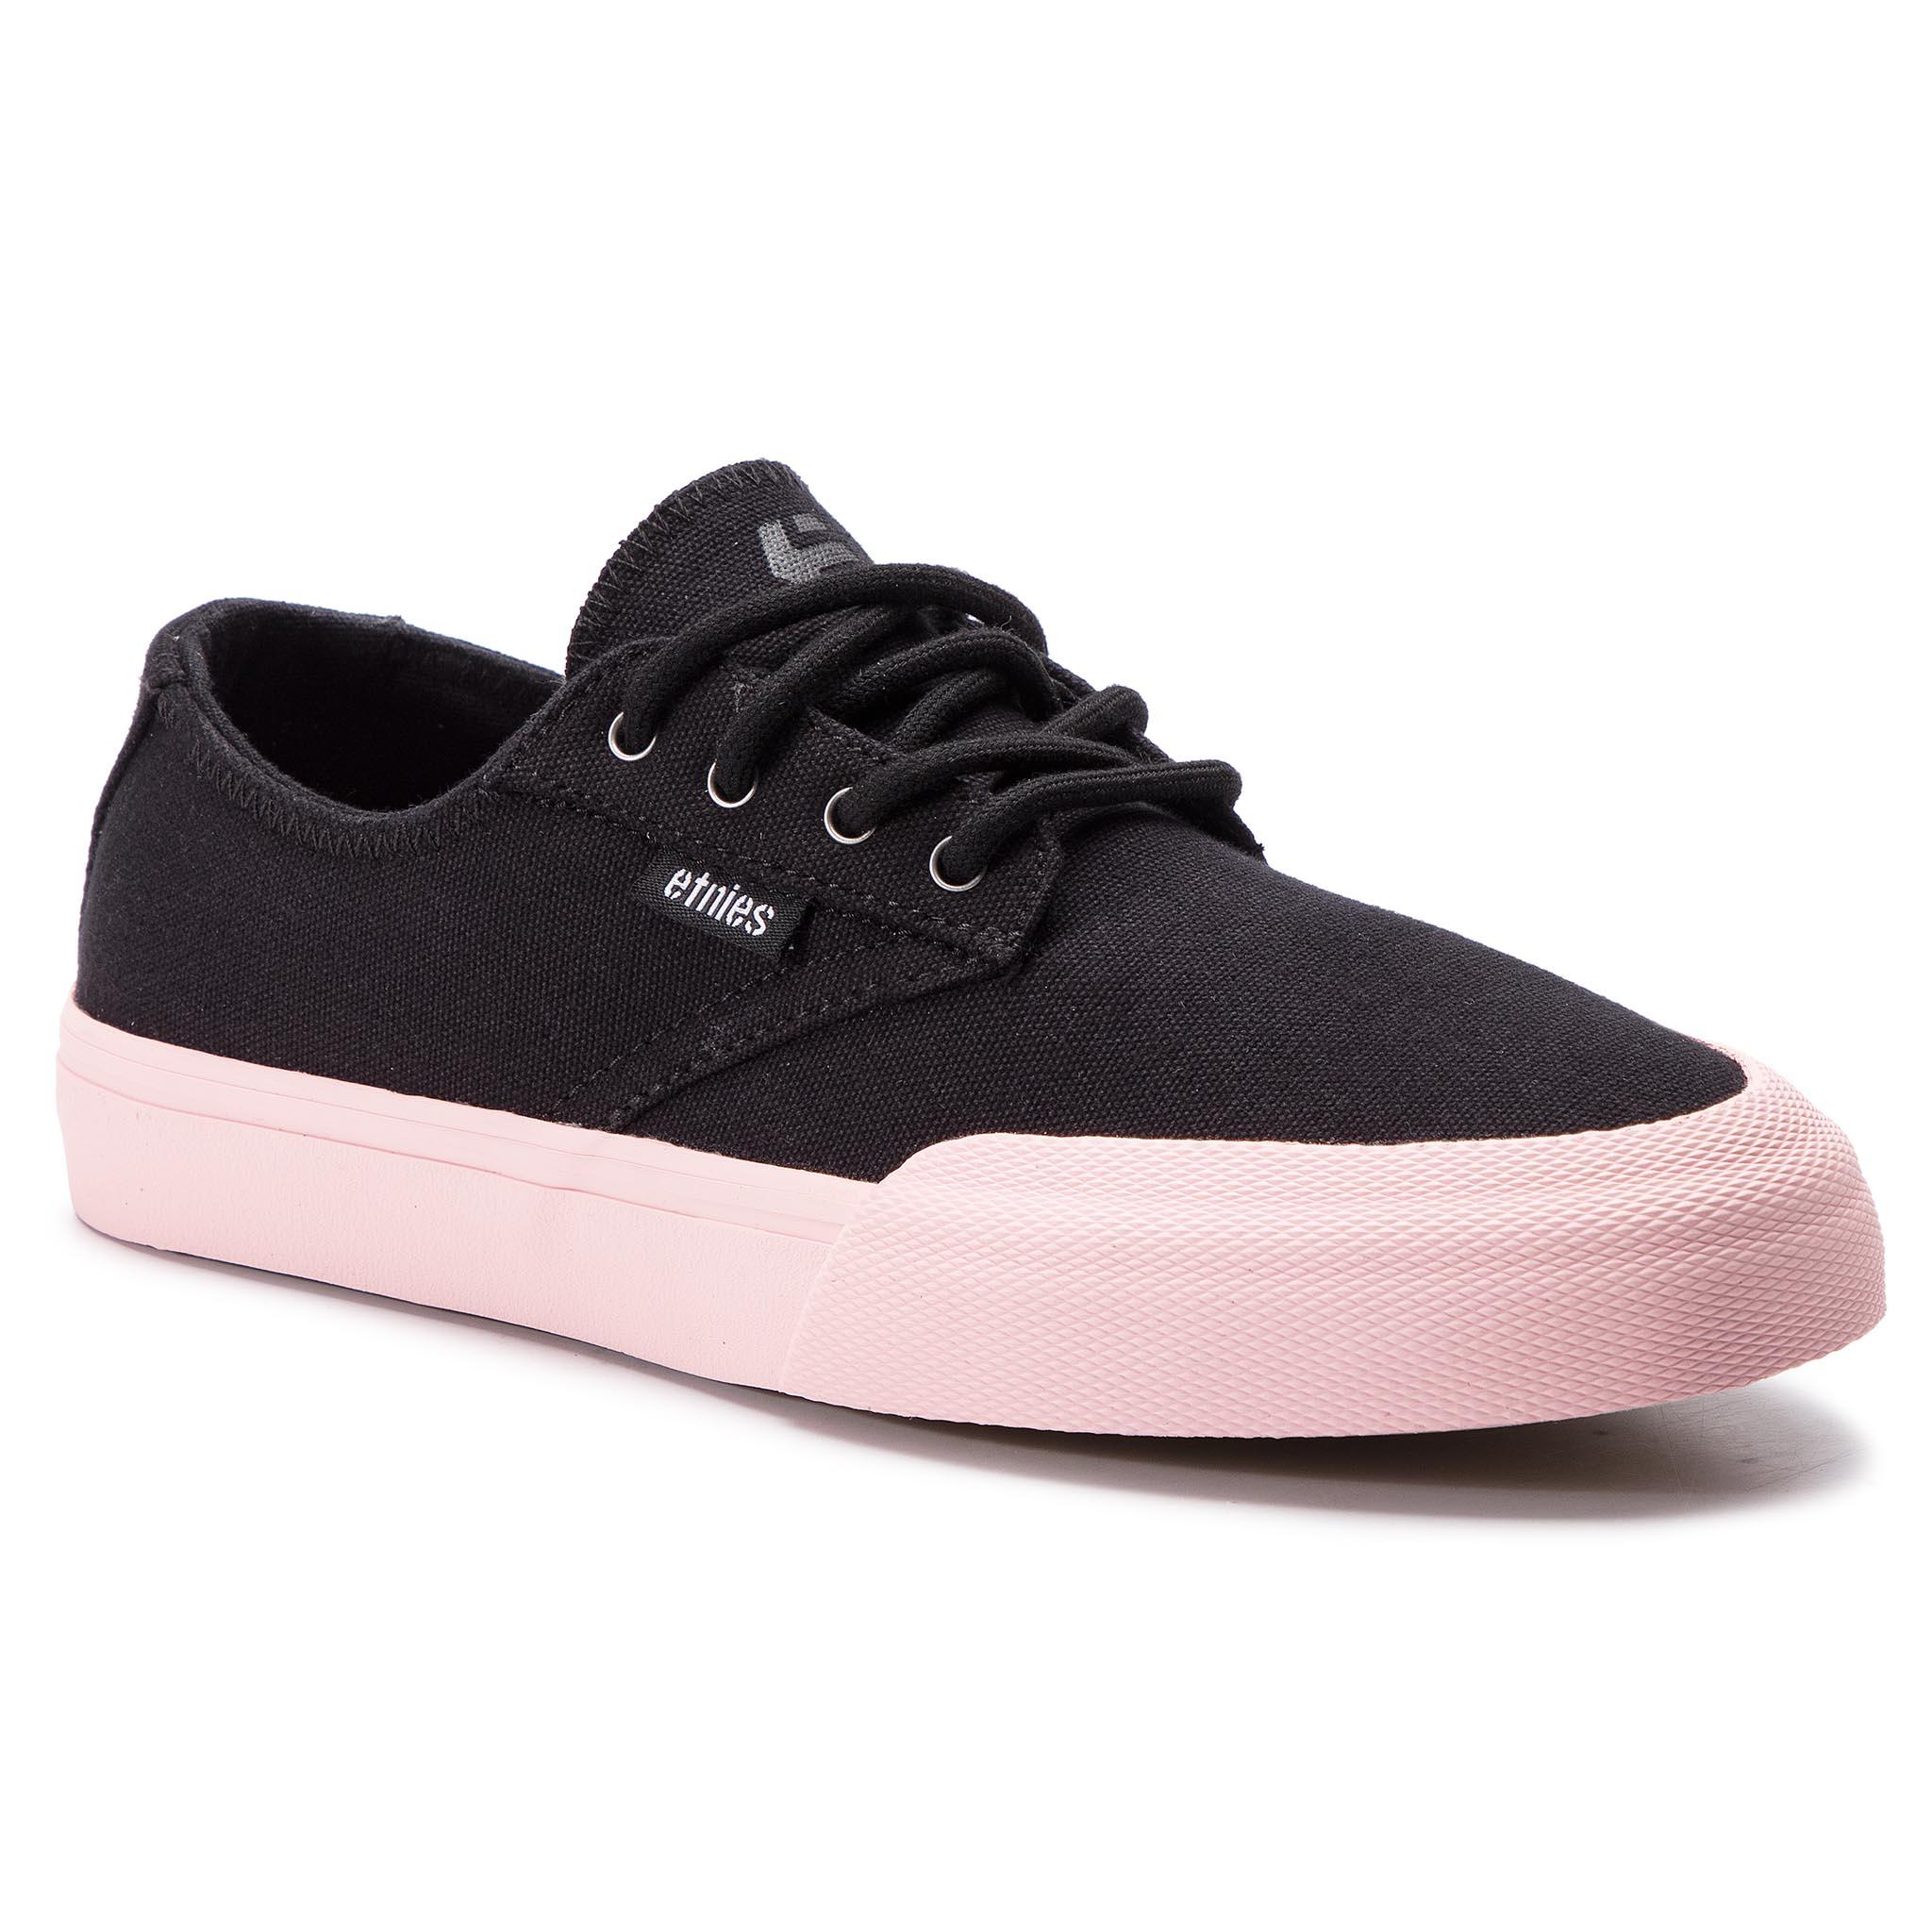 7f44a57070108 Sneakers PALLADIUM - Pallaphoenix Og Cvs 75733-919-M Indigo ...